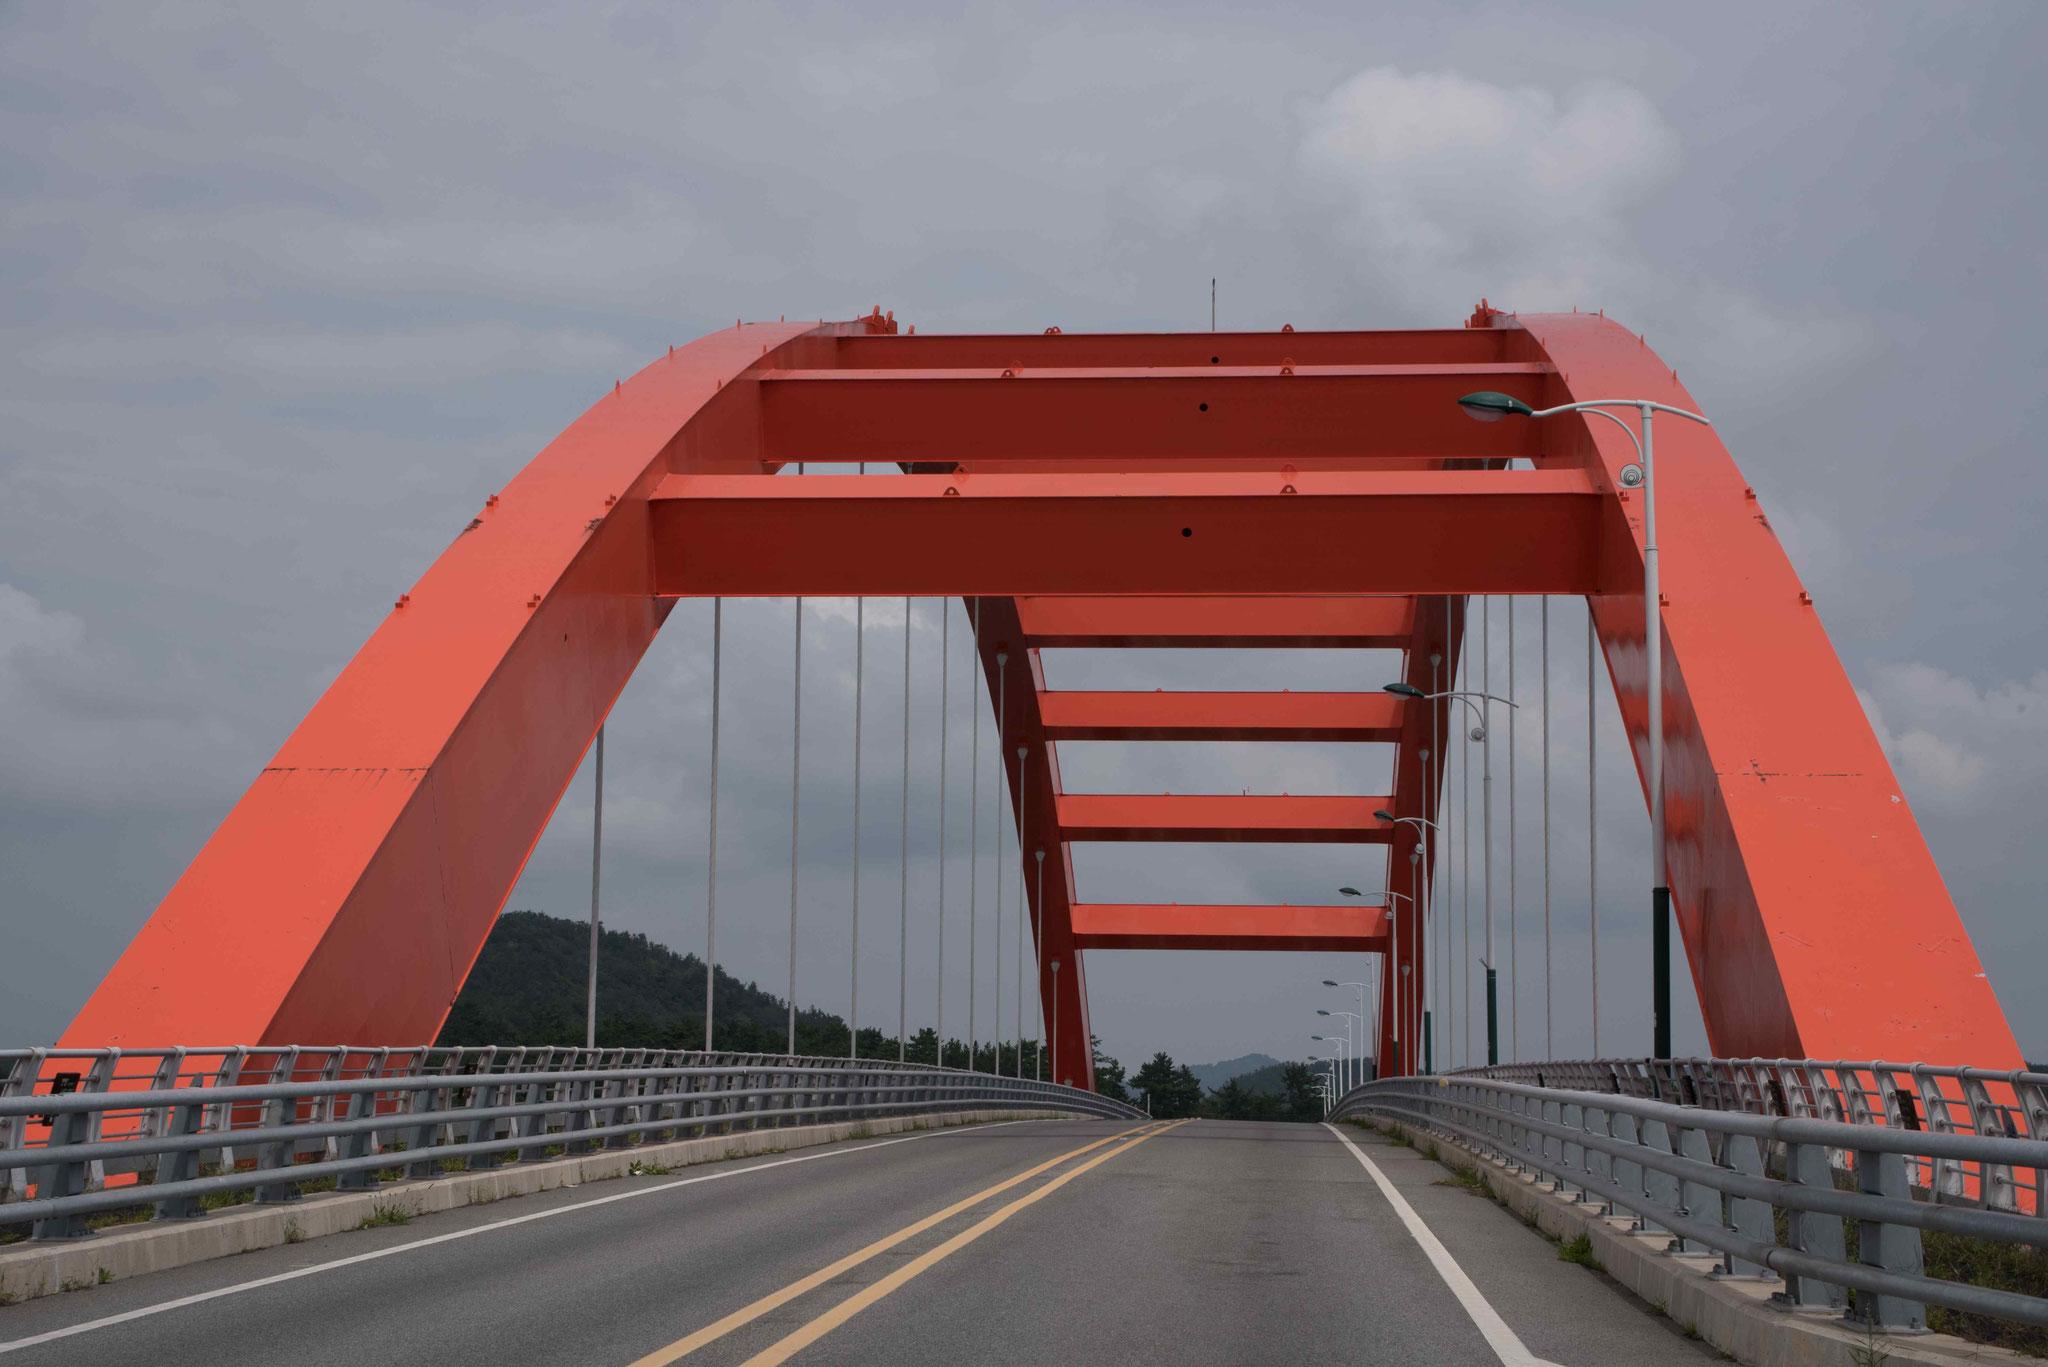 Interessante Bogenbrücke